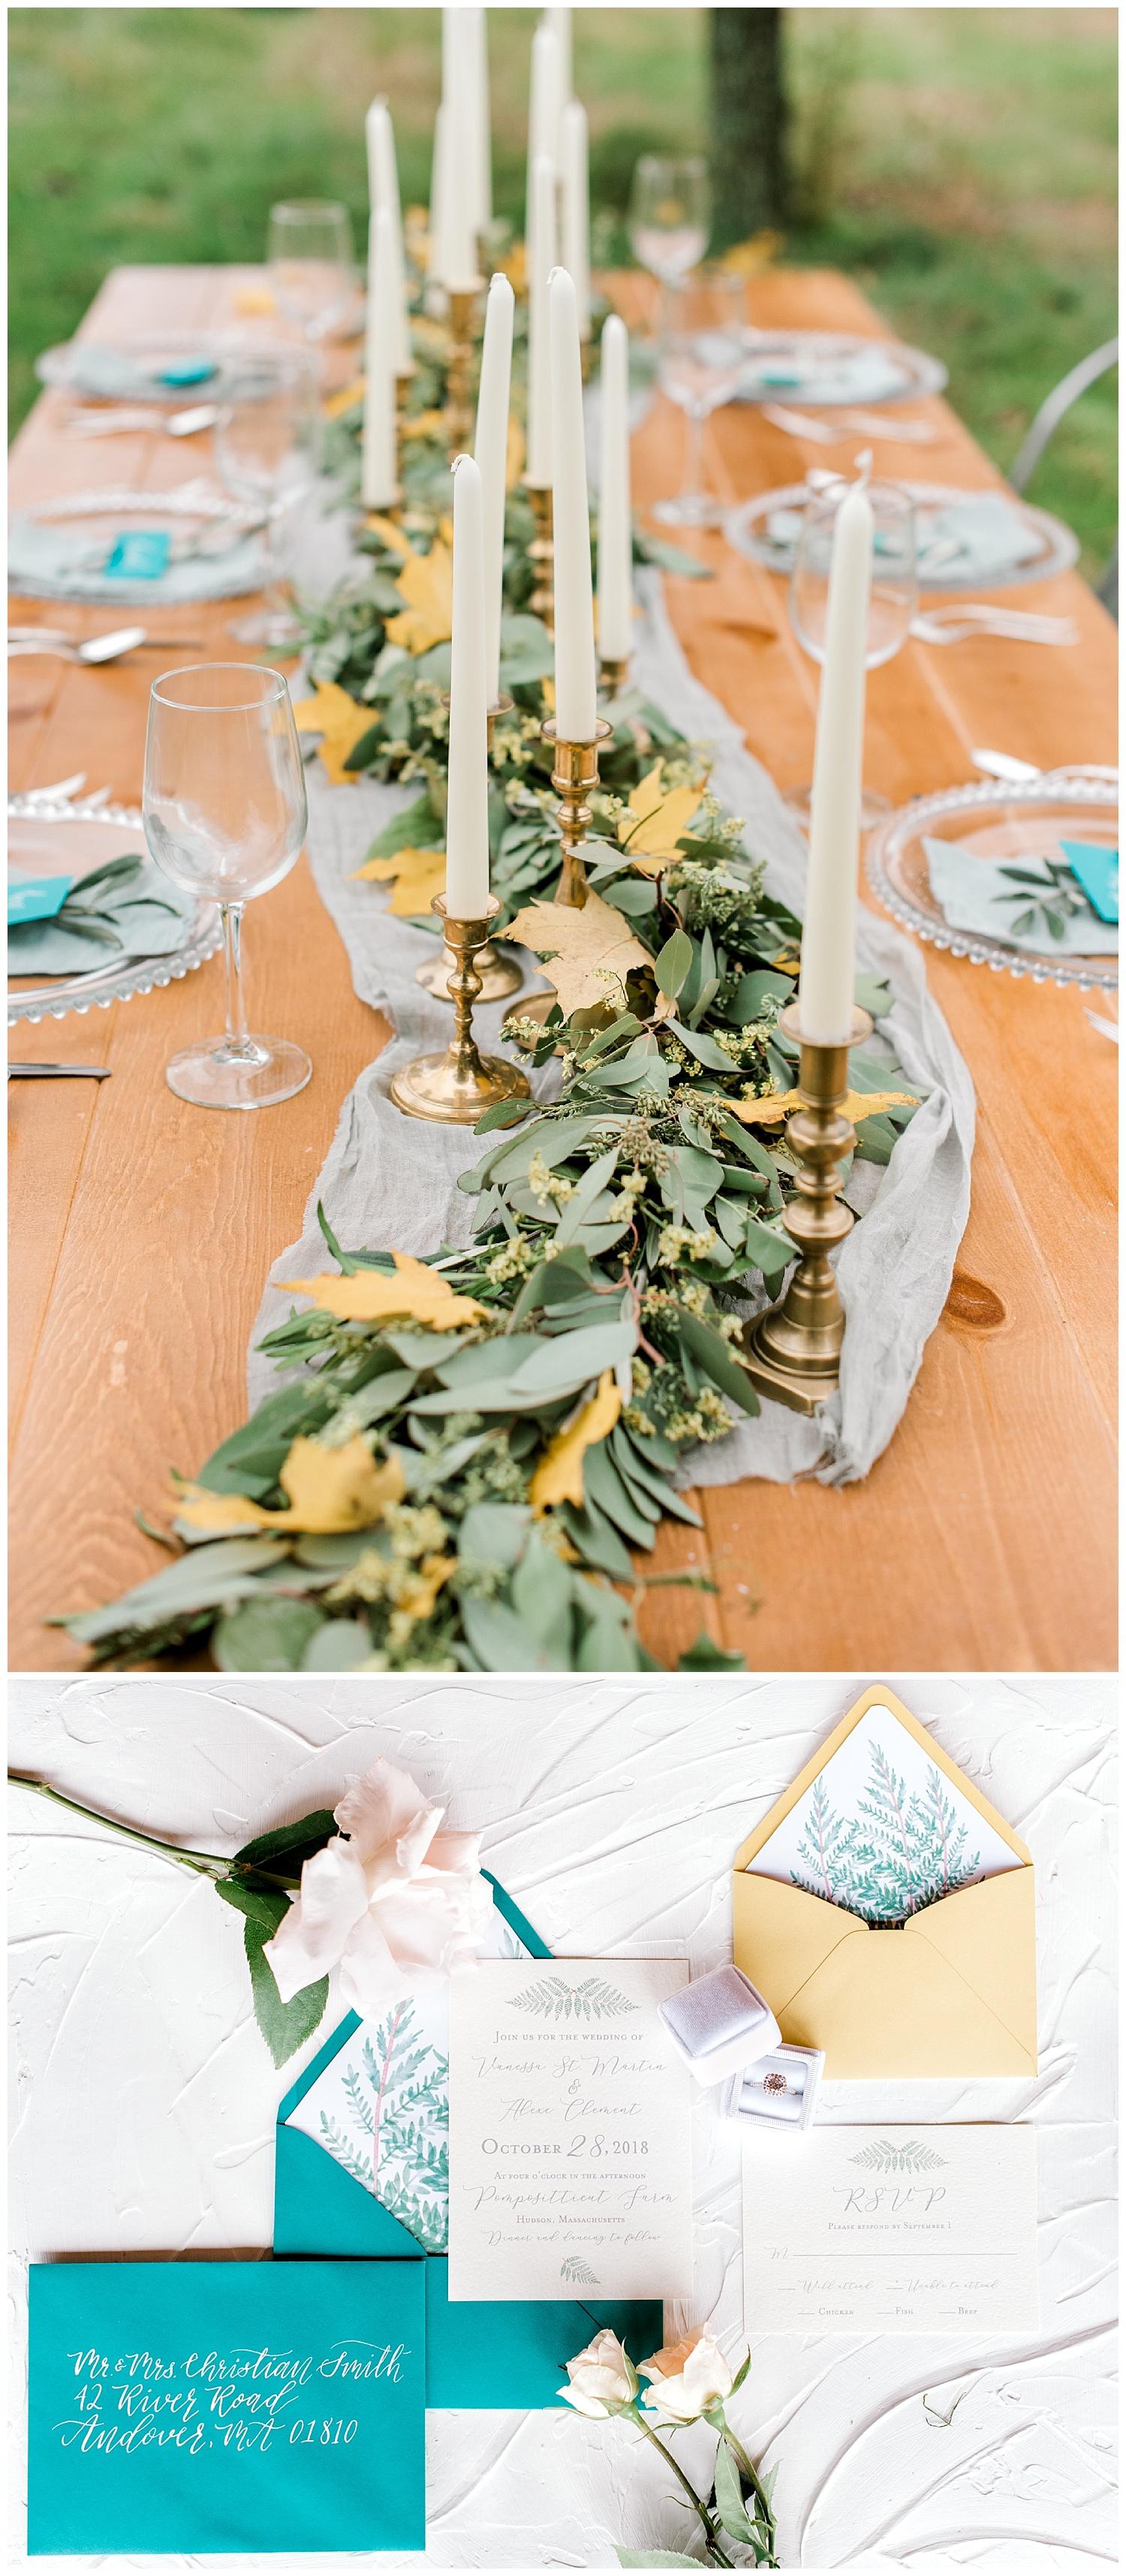 pompositticut-farm-fall-wedding-photography-hudson-massachusetts-photo-8.jpg